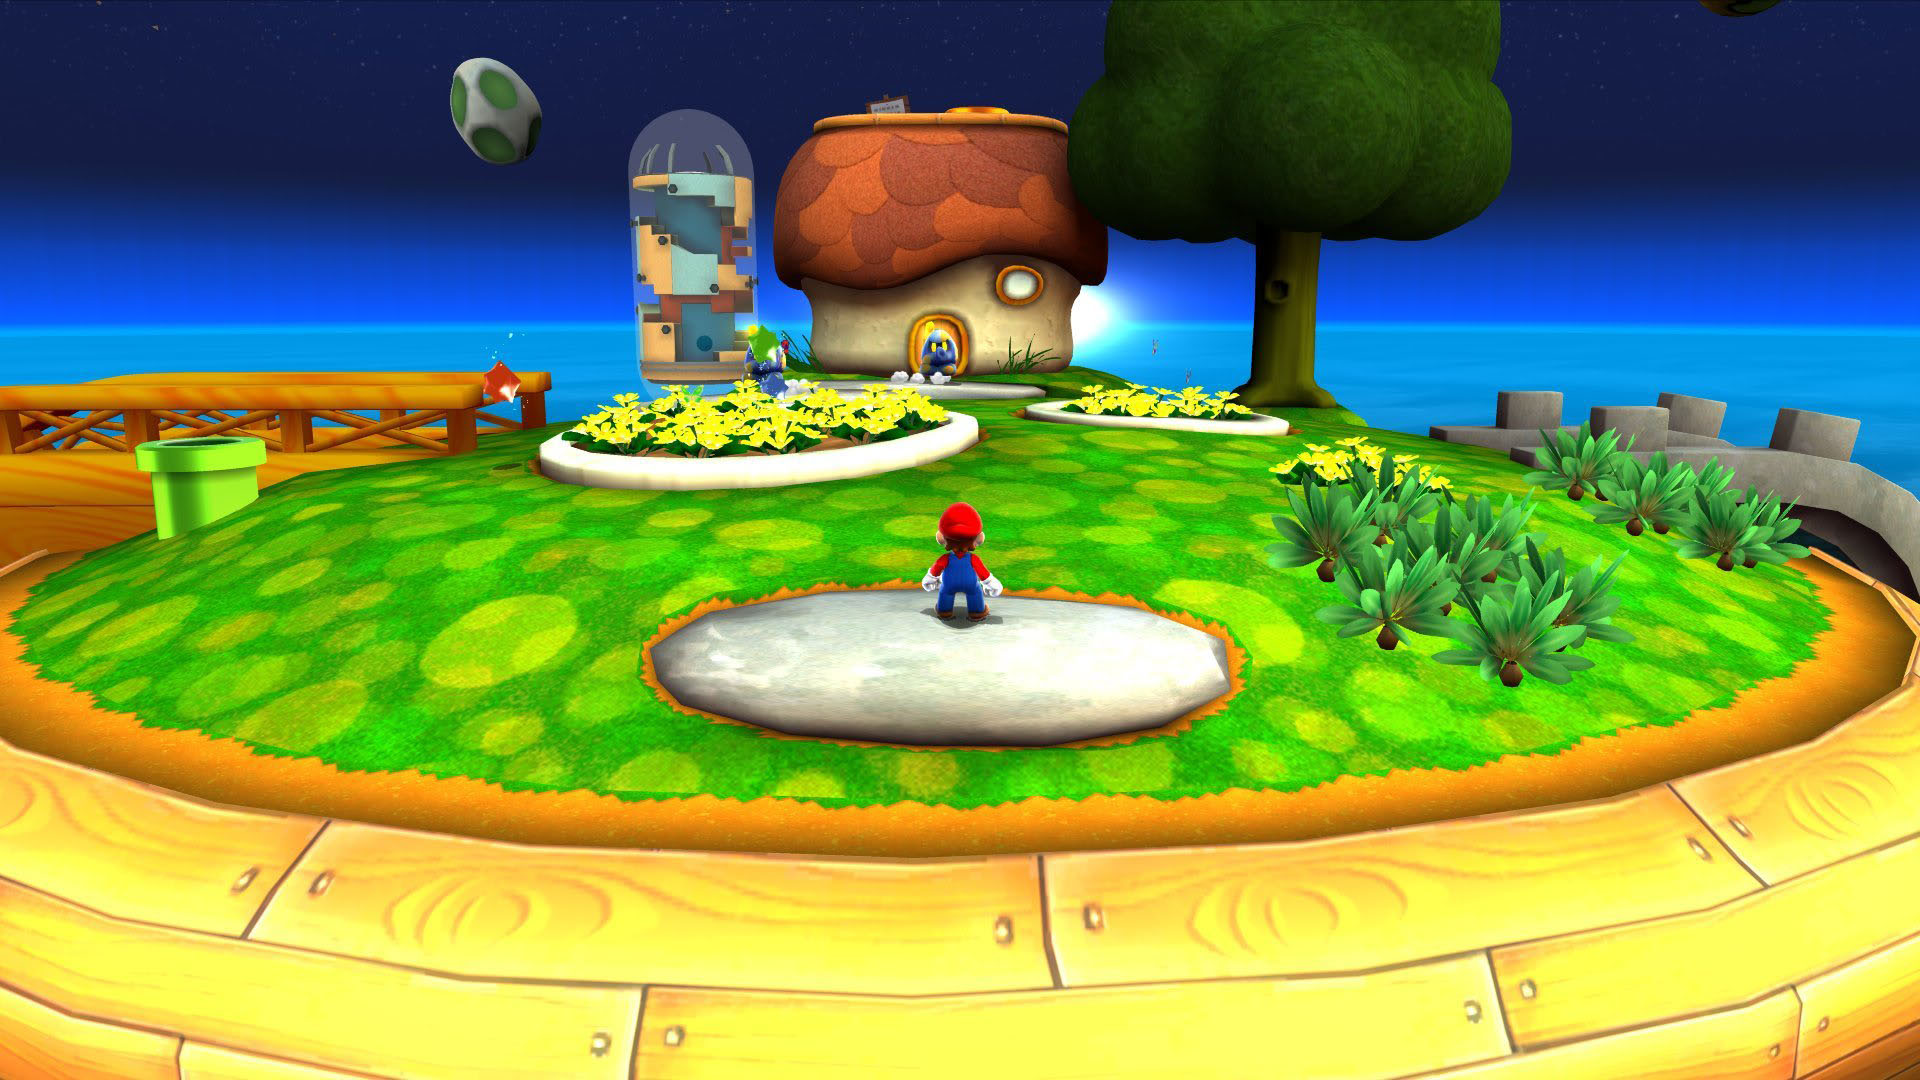 Mario In His Garden